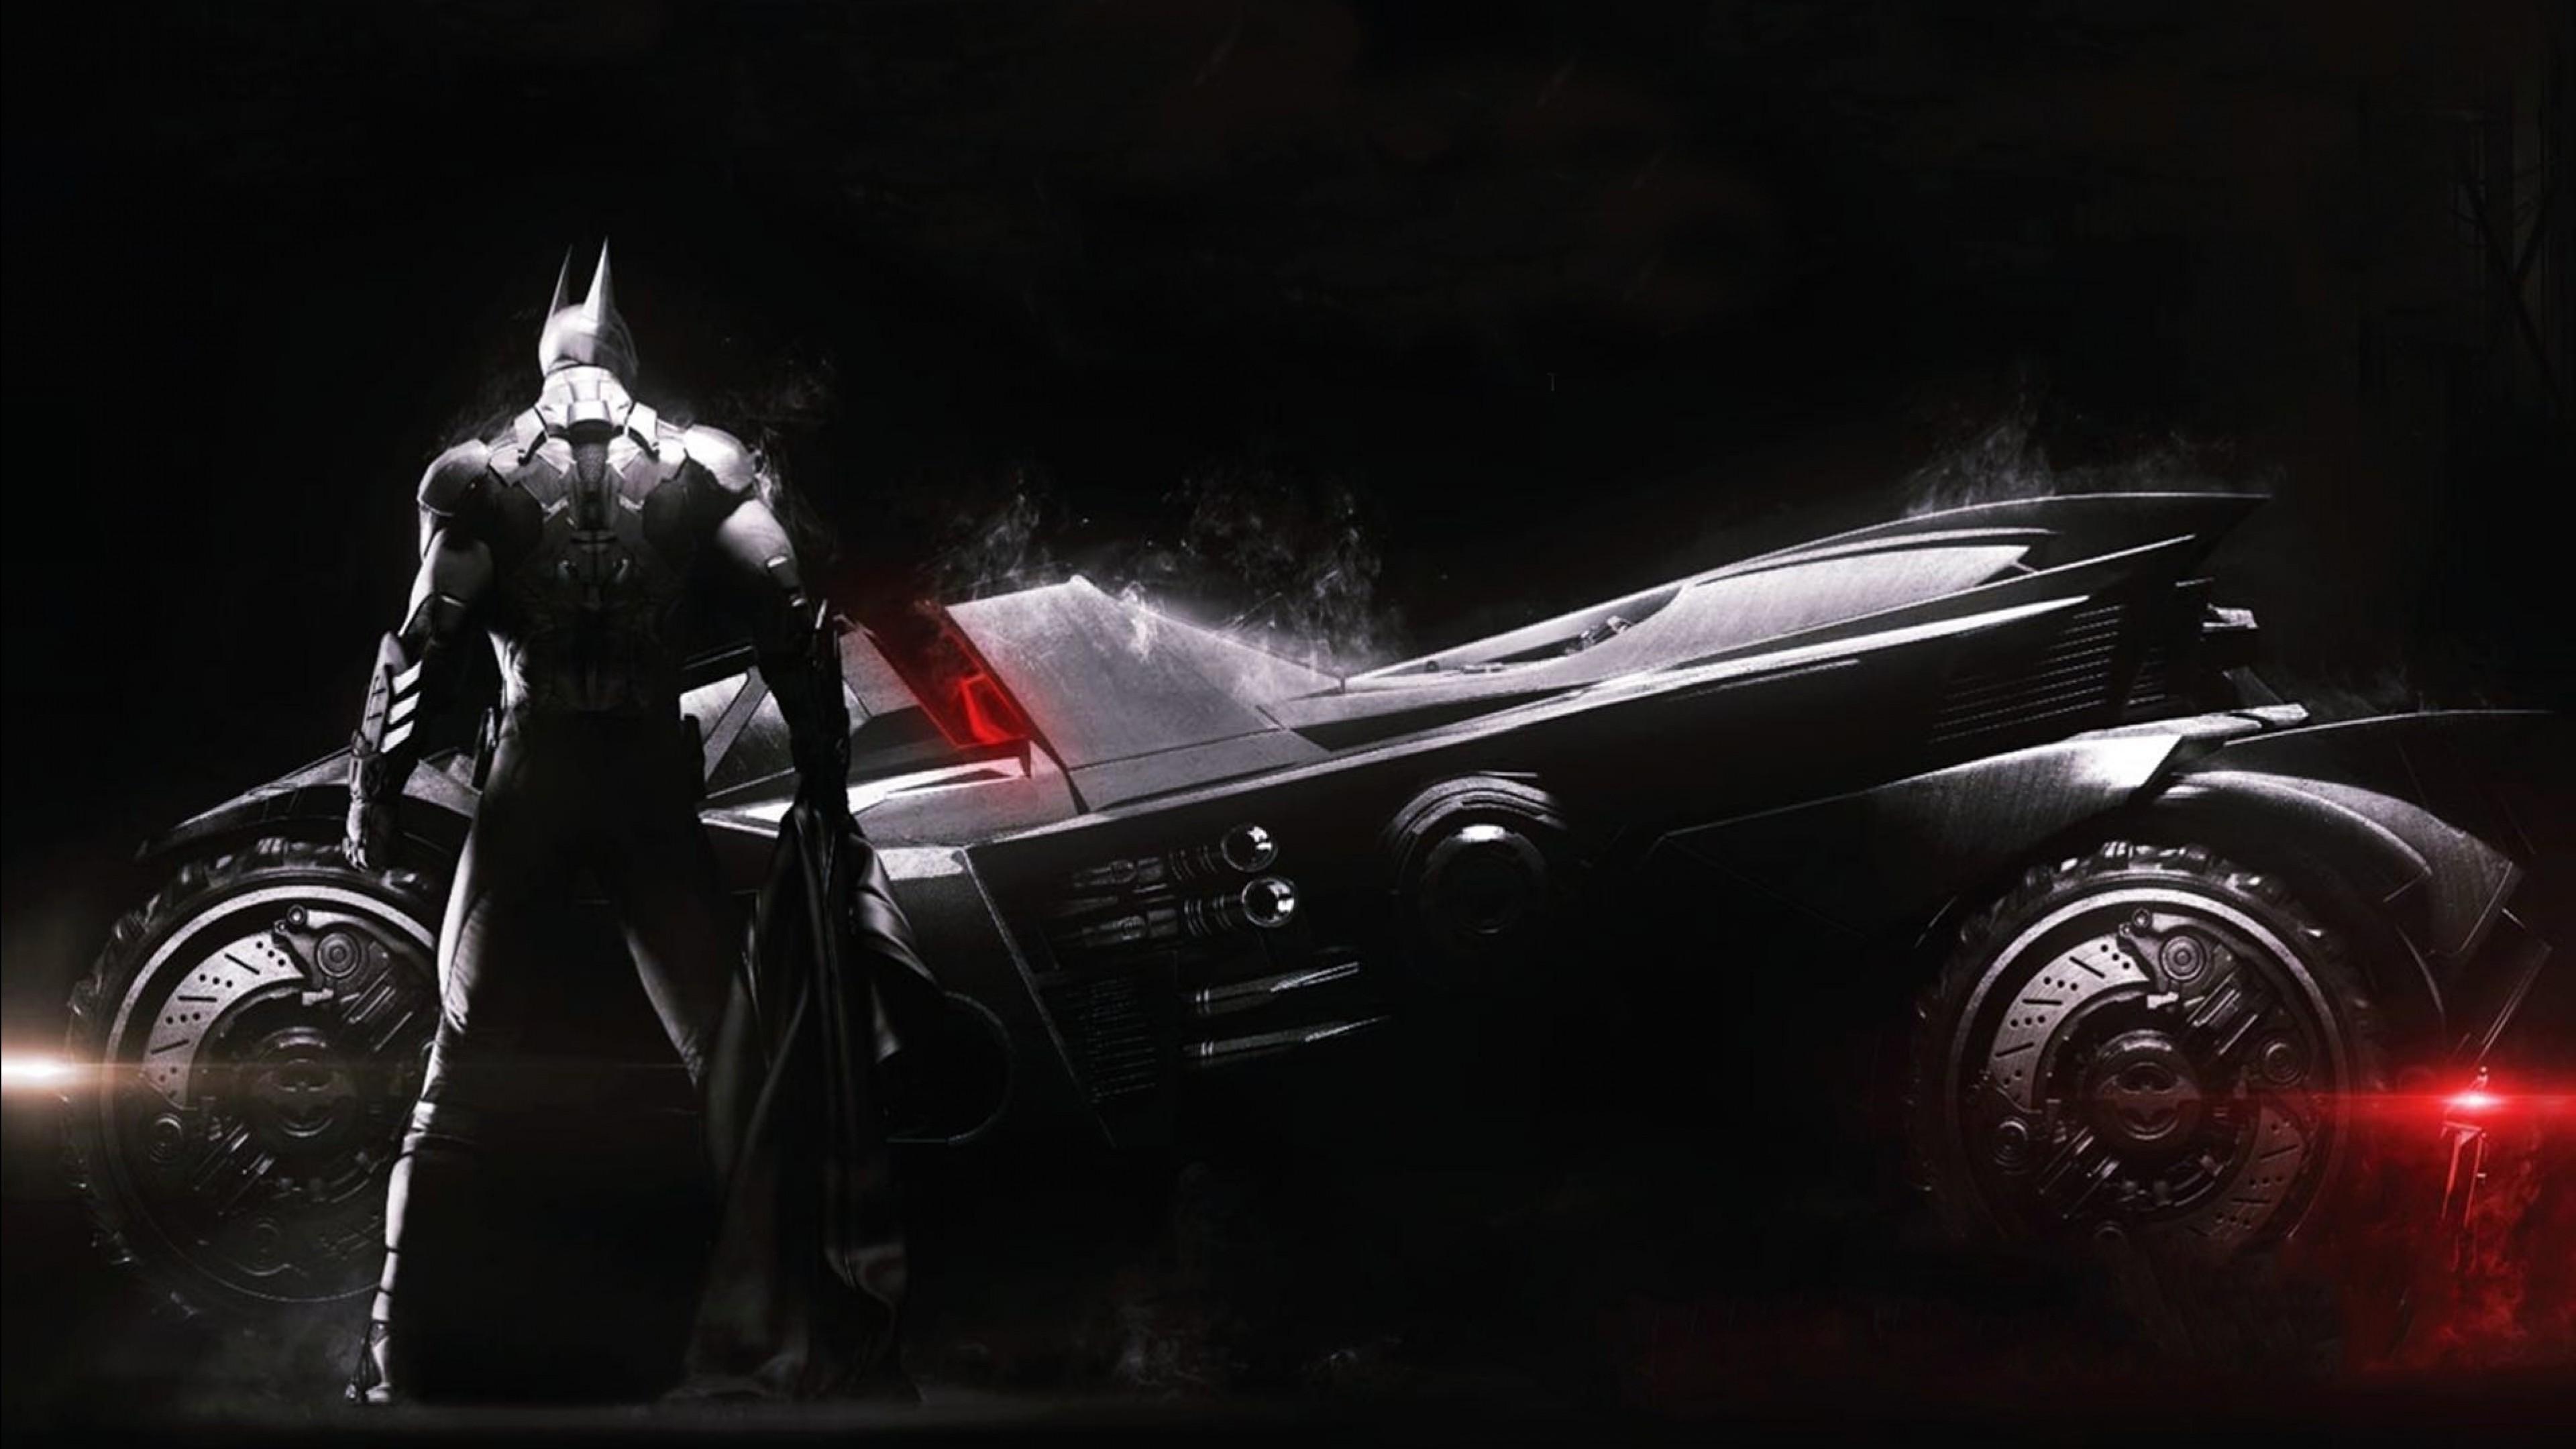 Wallpaper Video Games Night Motorcycle Vehicle Batman Arkham